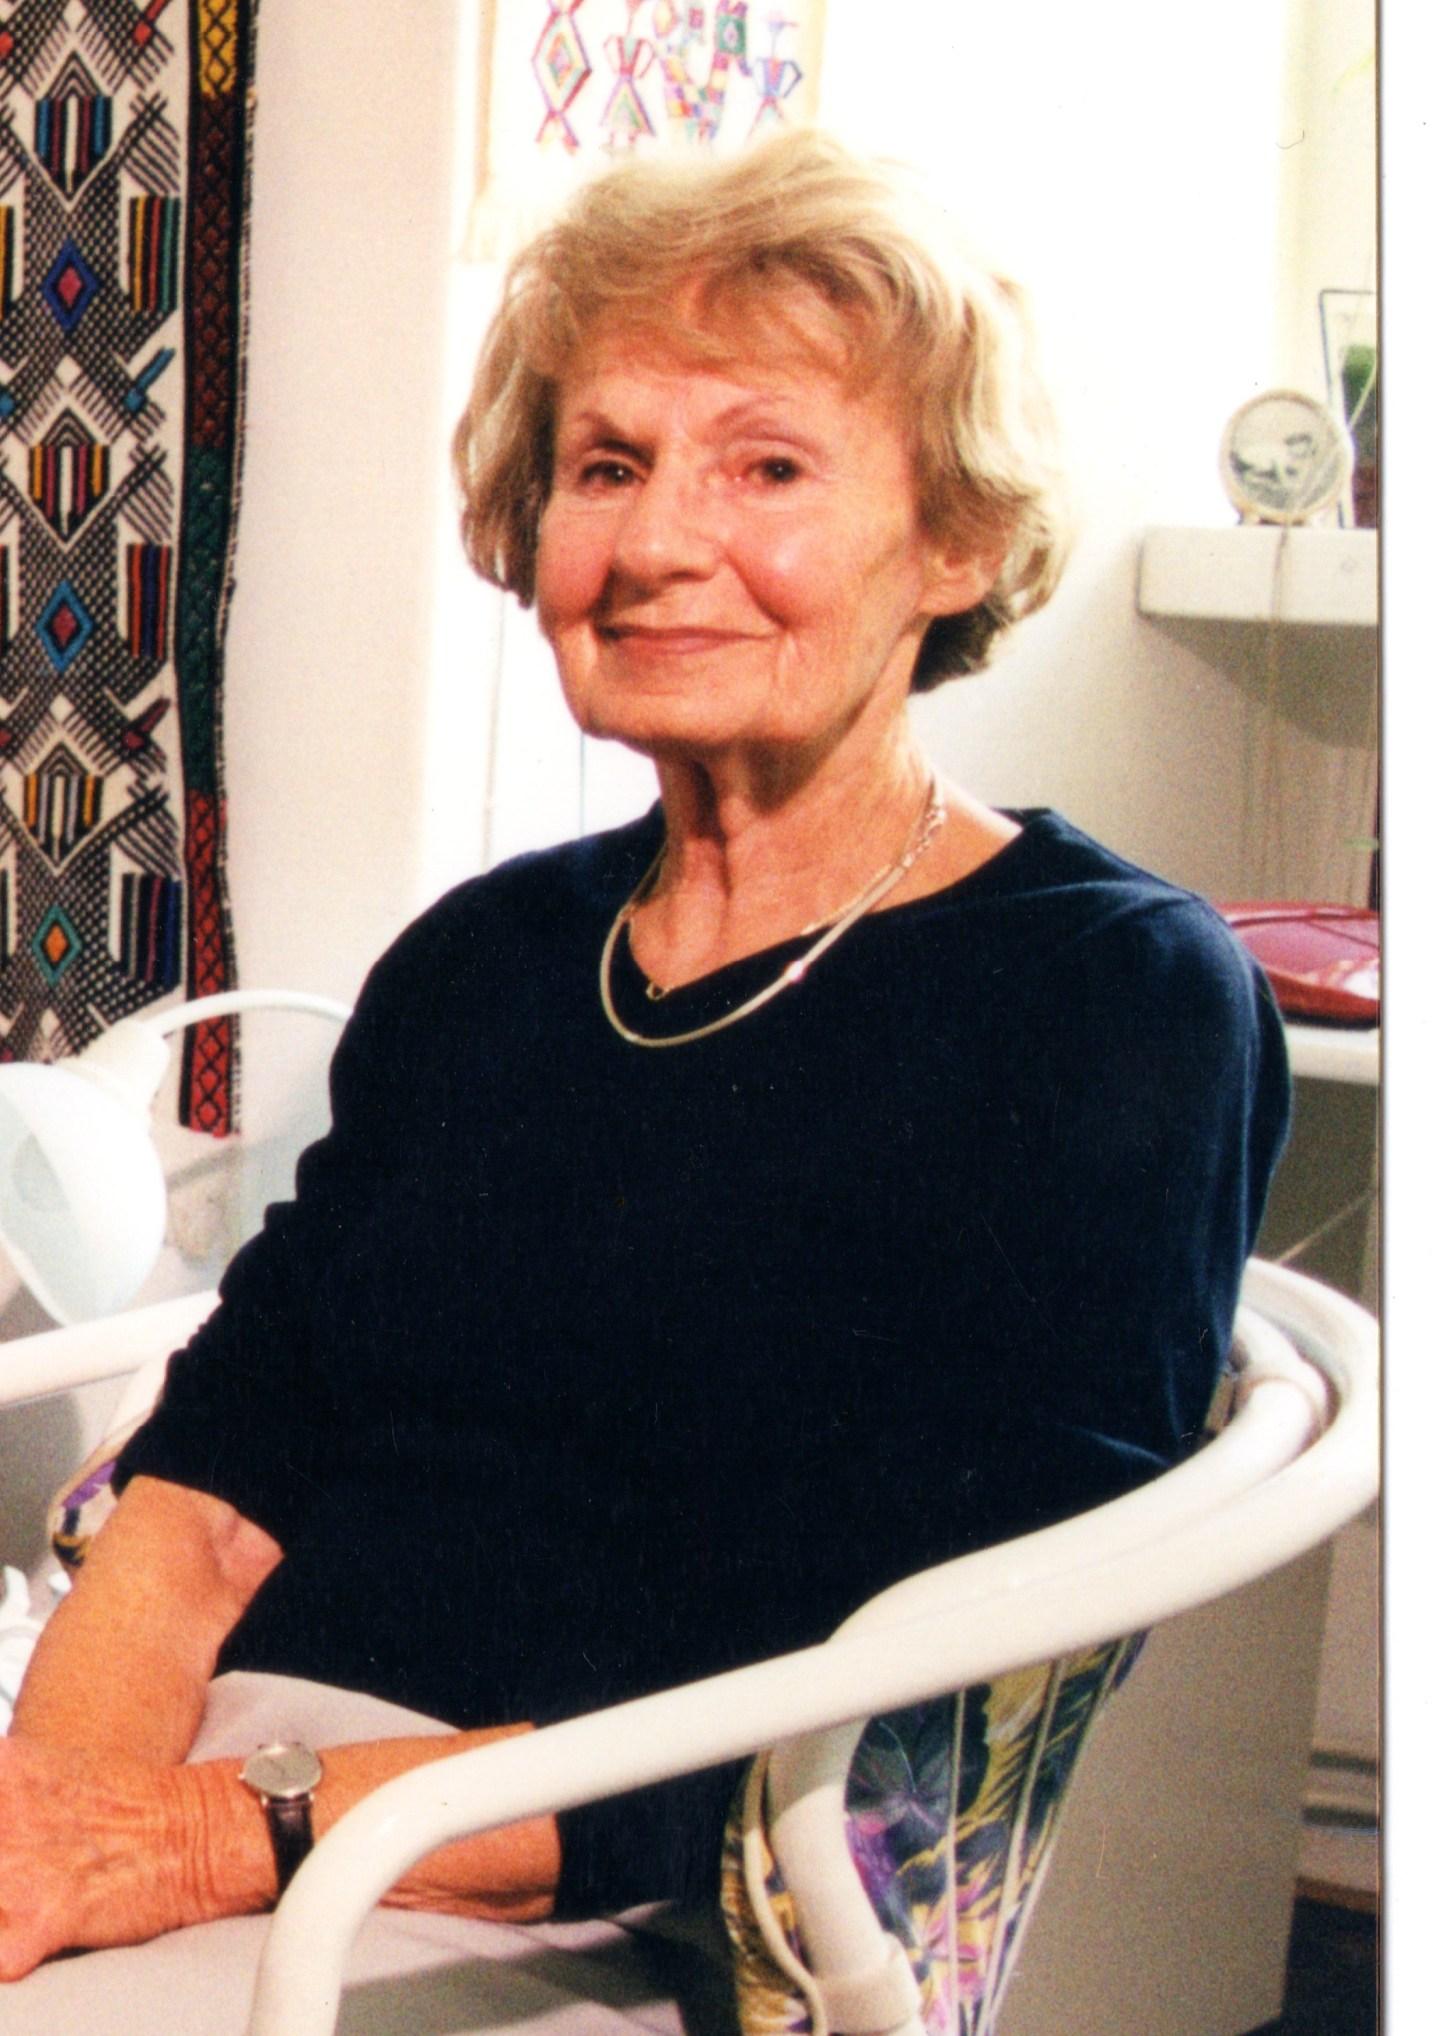 2000 Portrait of Heda Margolius Kovály, author of Hitler Stalin and I